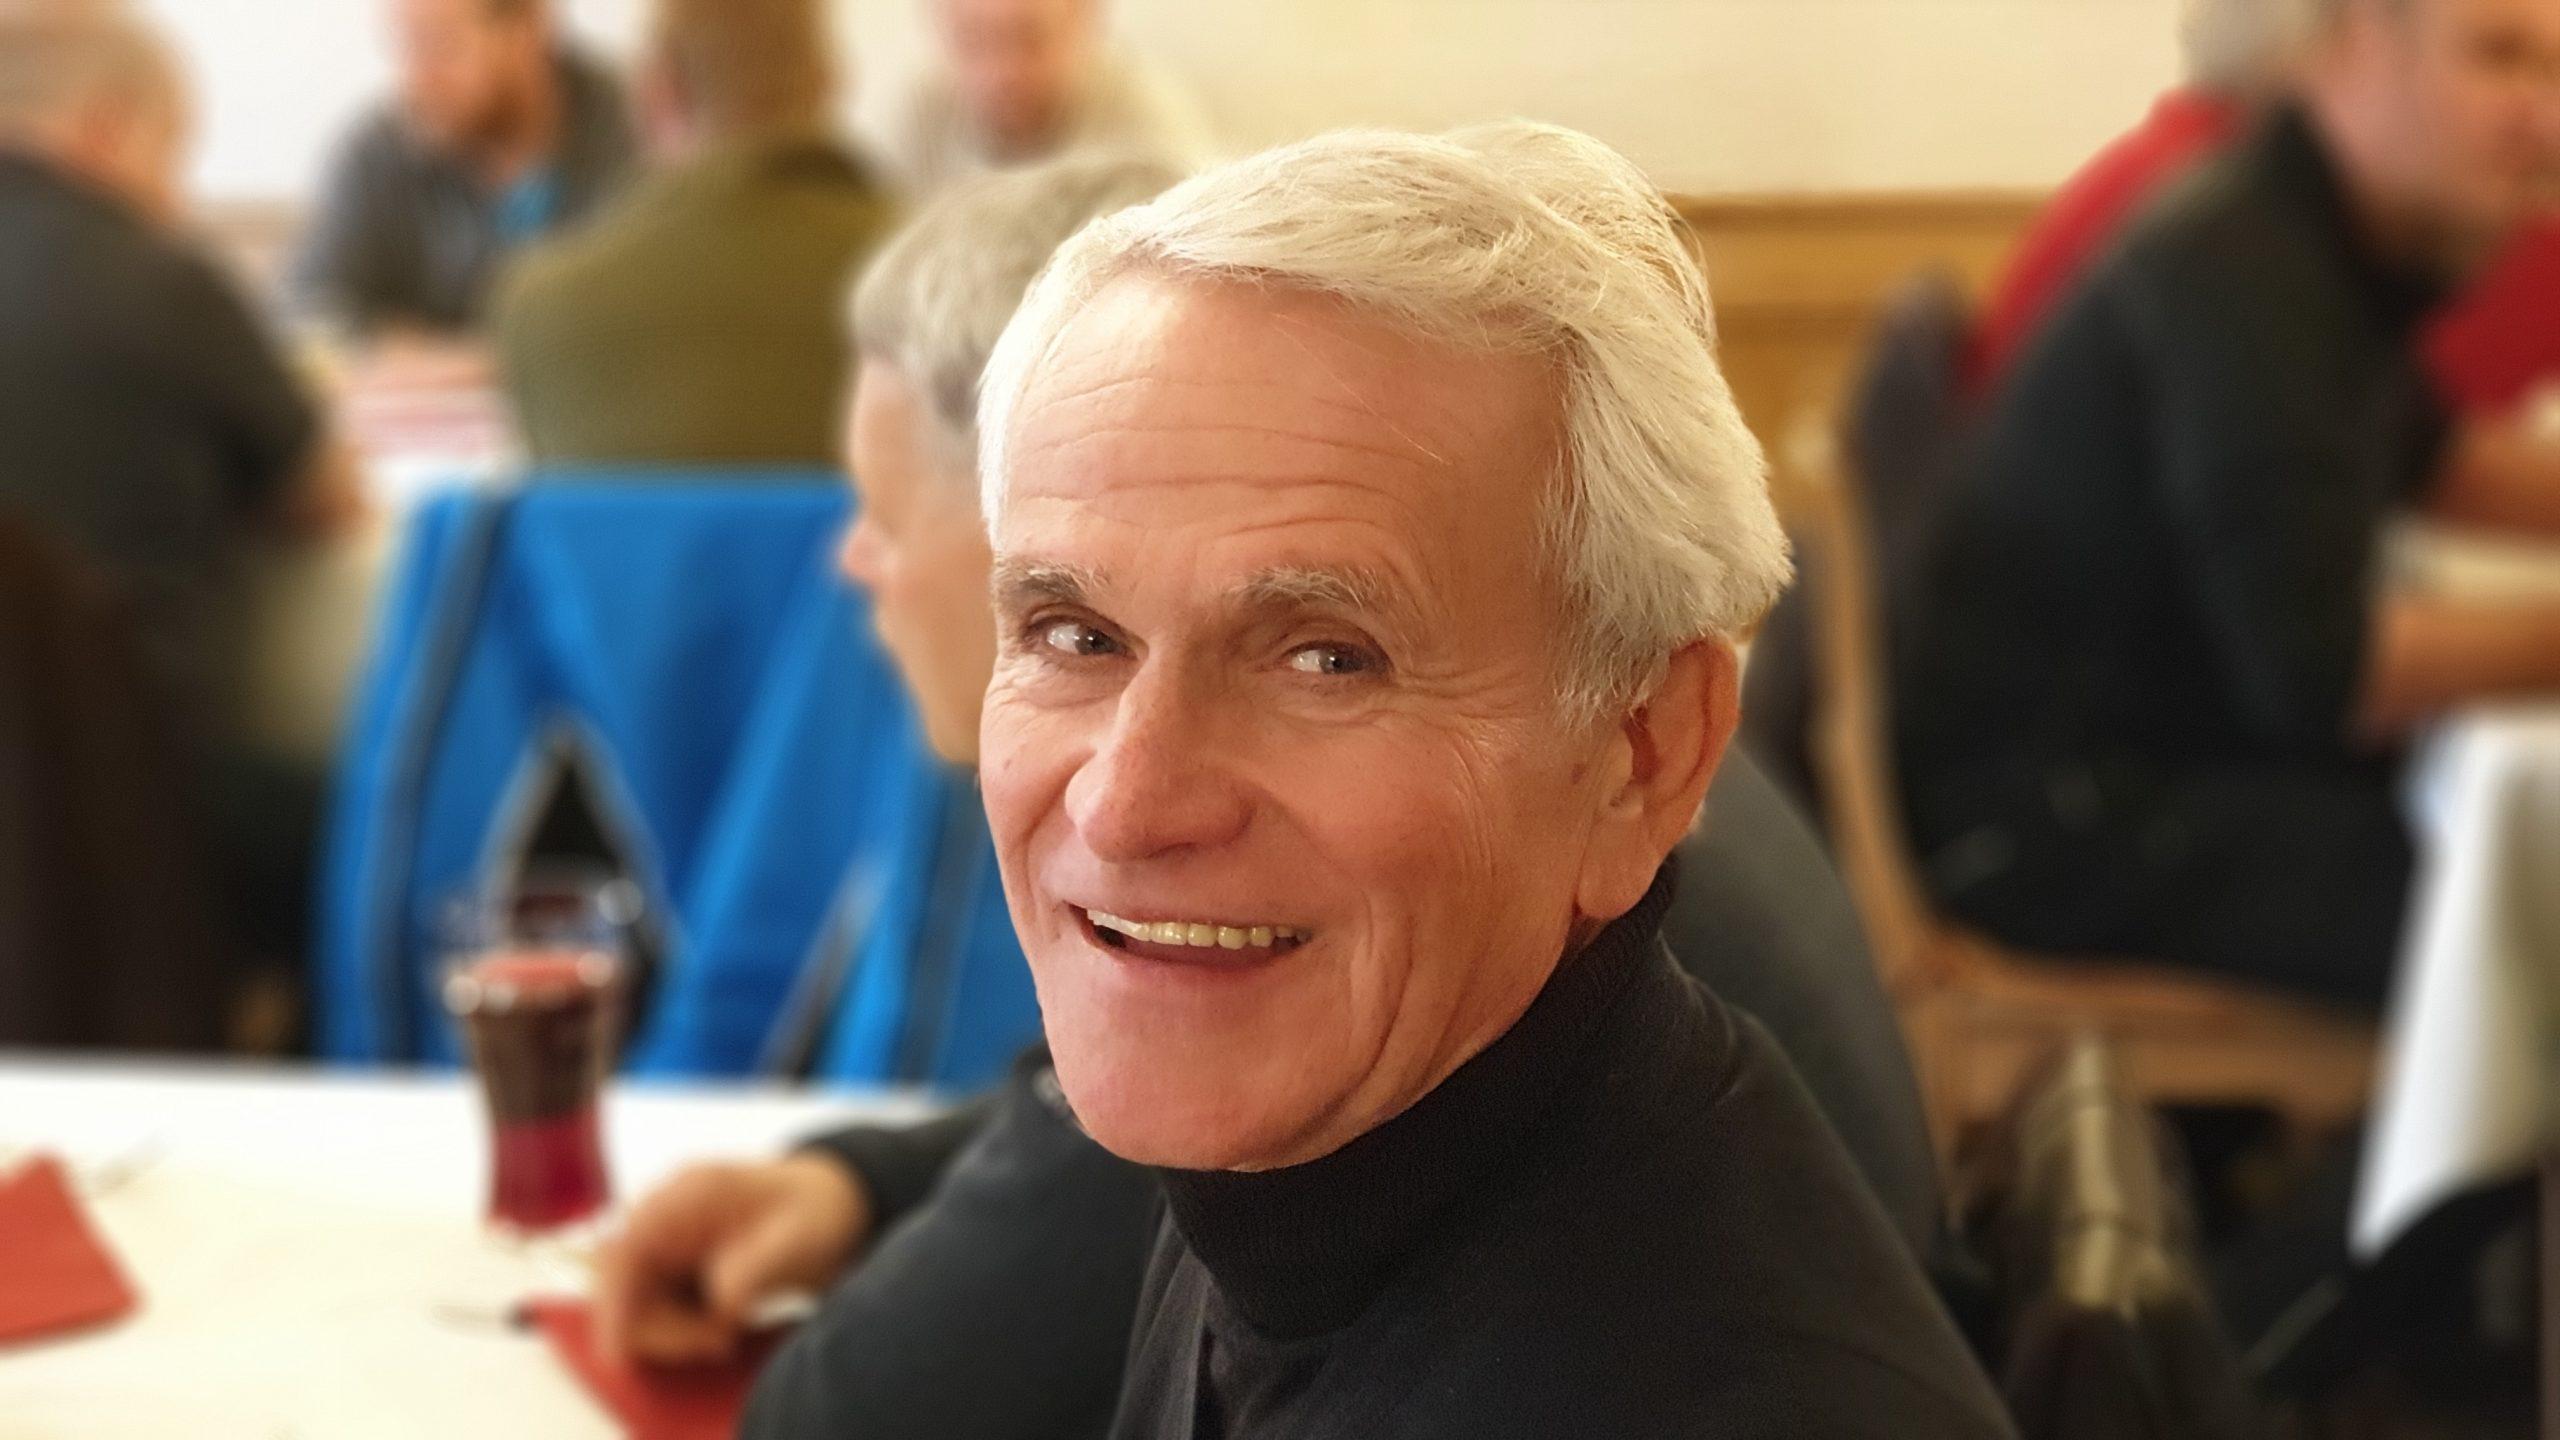 Hermann Richter